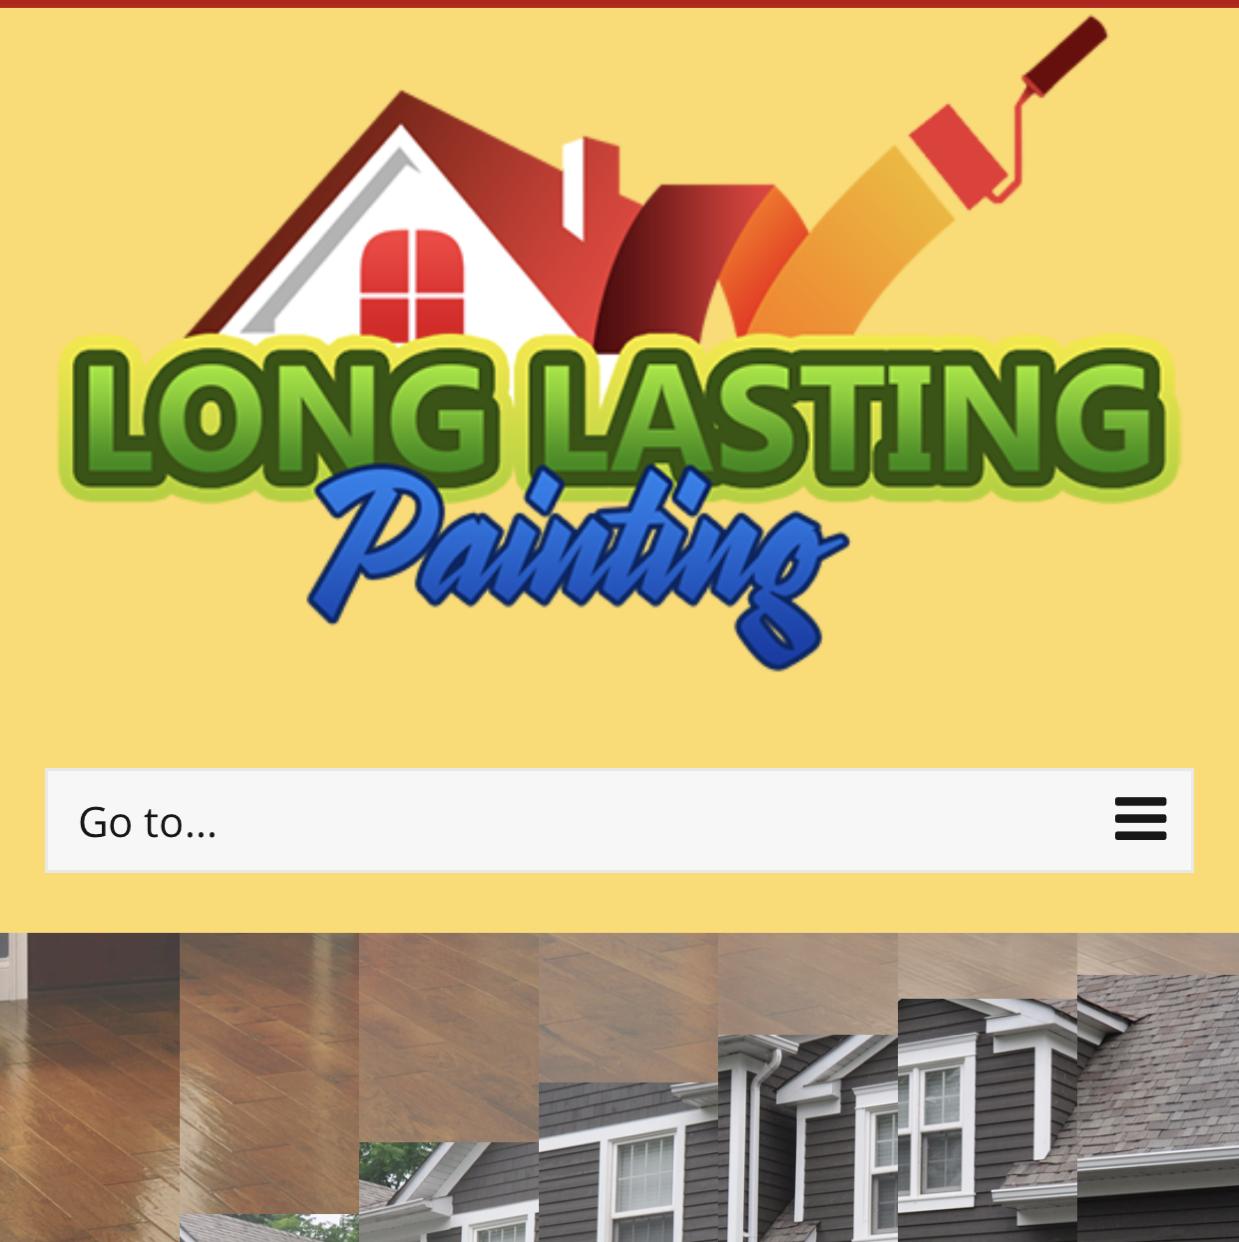 Long Lasting Painting logo